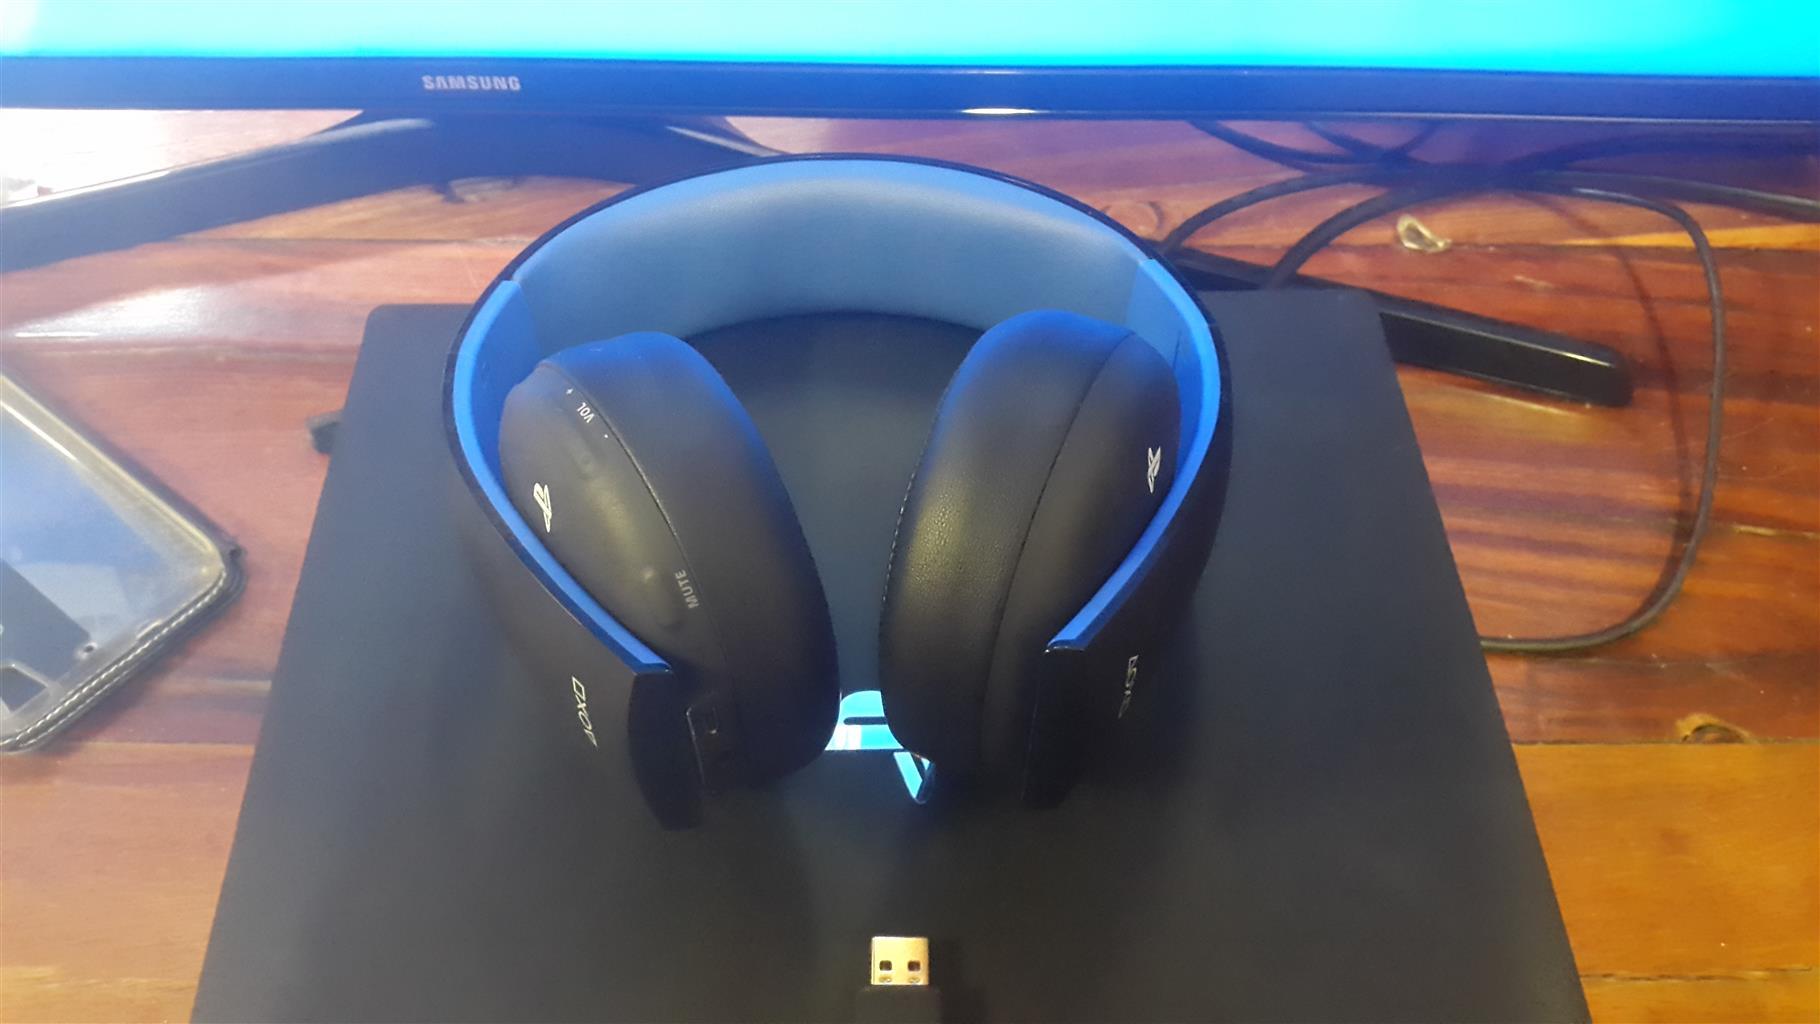 Ps4 pro headphones account